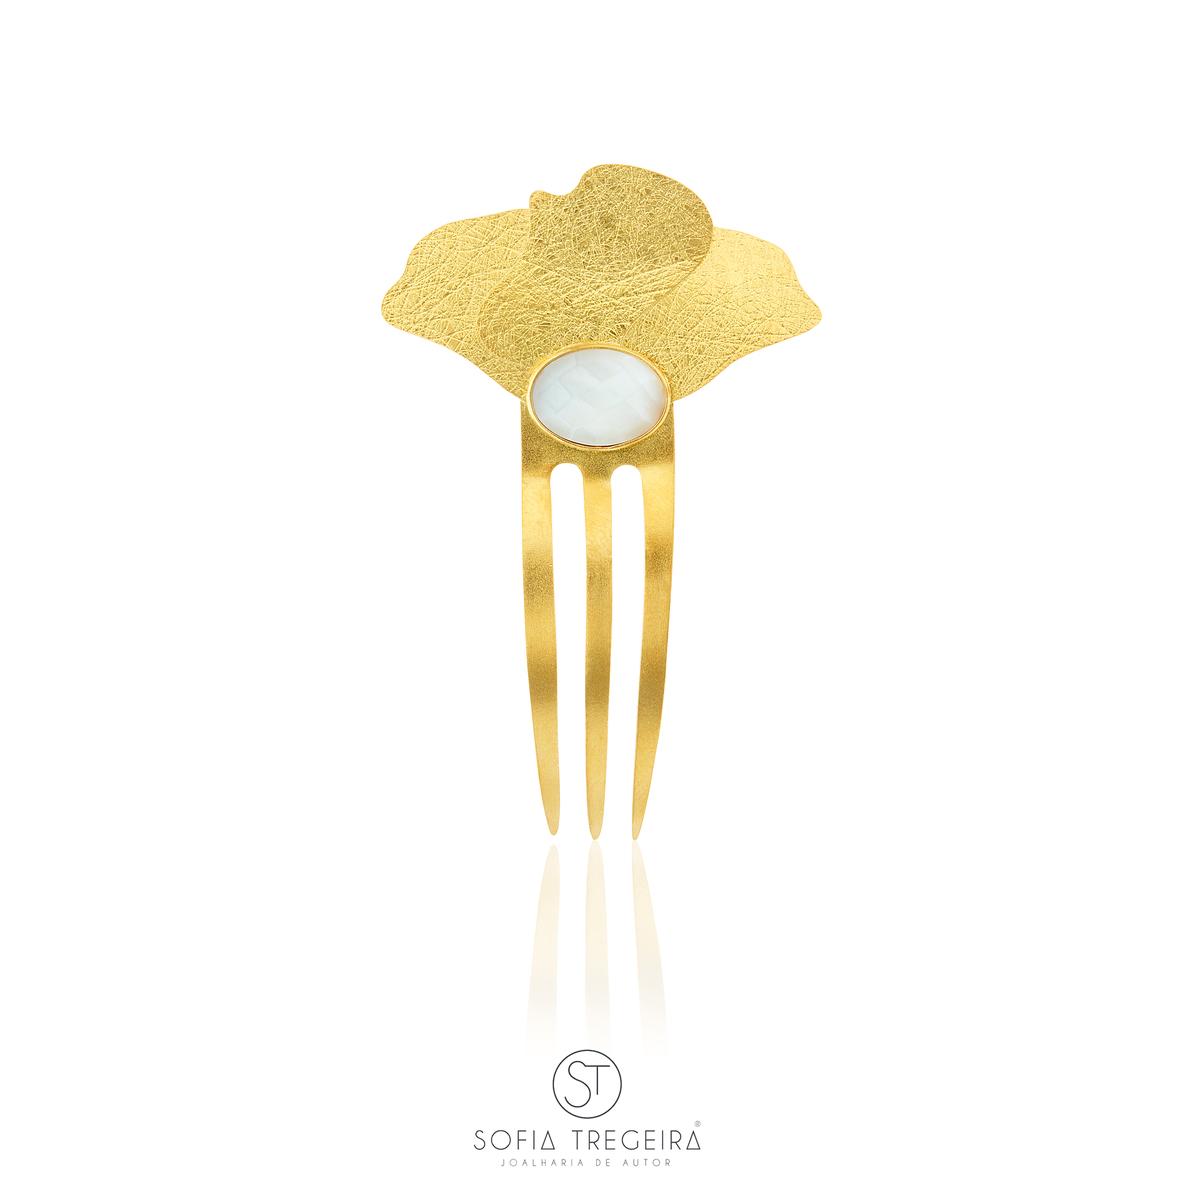 joalharia de autor; joalharia de luxo sofia tregeira; wild poppy; collection; toucado; headdress; teara; prata; silver; ouro; gold; joalharia; jewellery; luxury;  jóias de casamento; wedding jewellery; noiva; bride; jóias de luxo; joalharia portuguesa